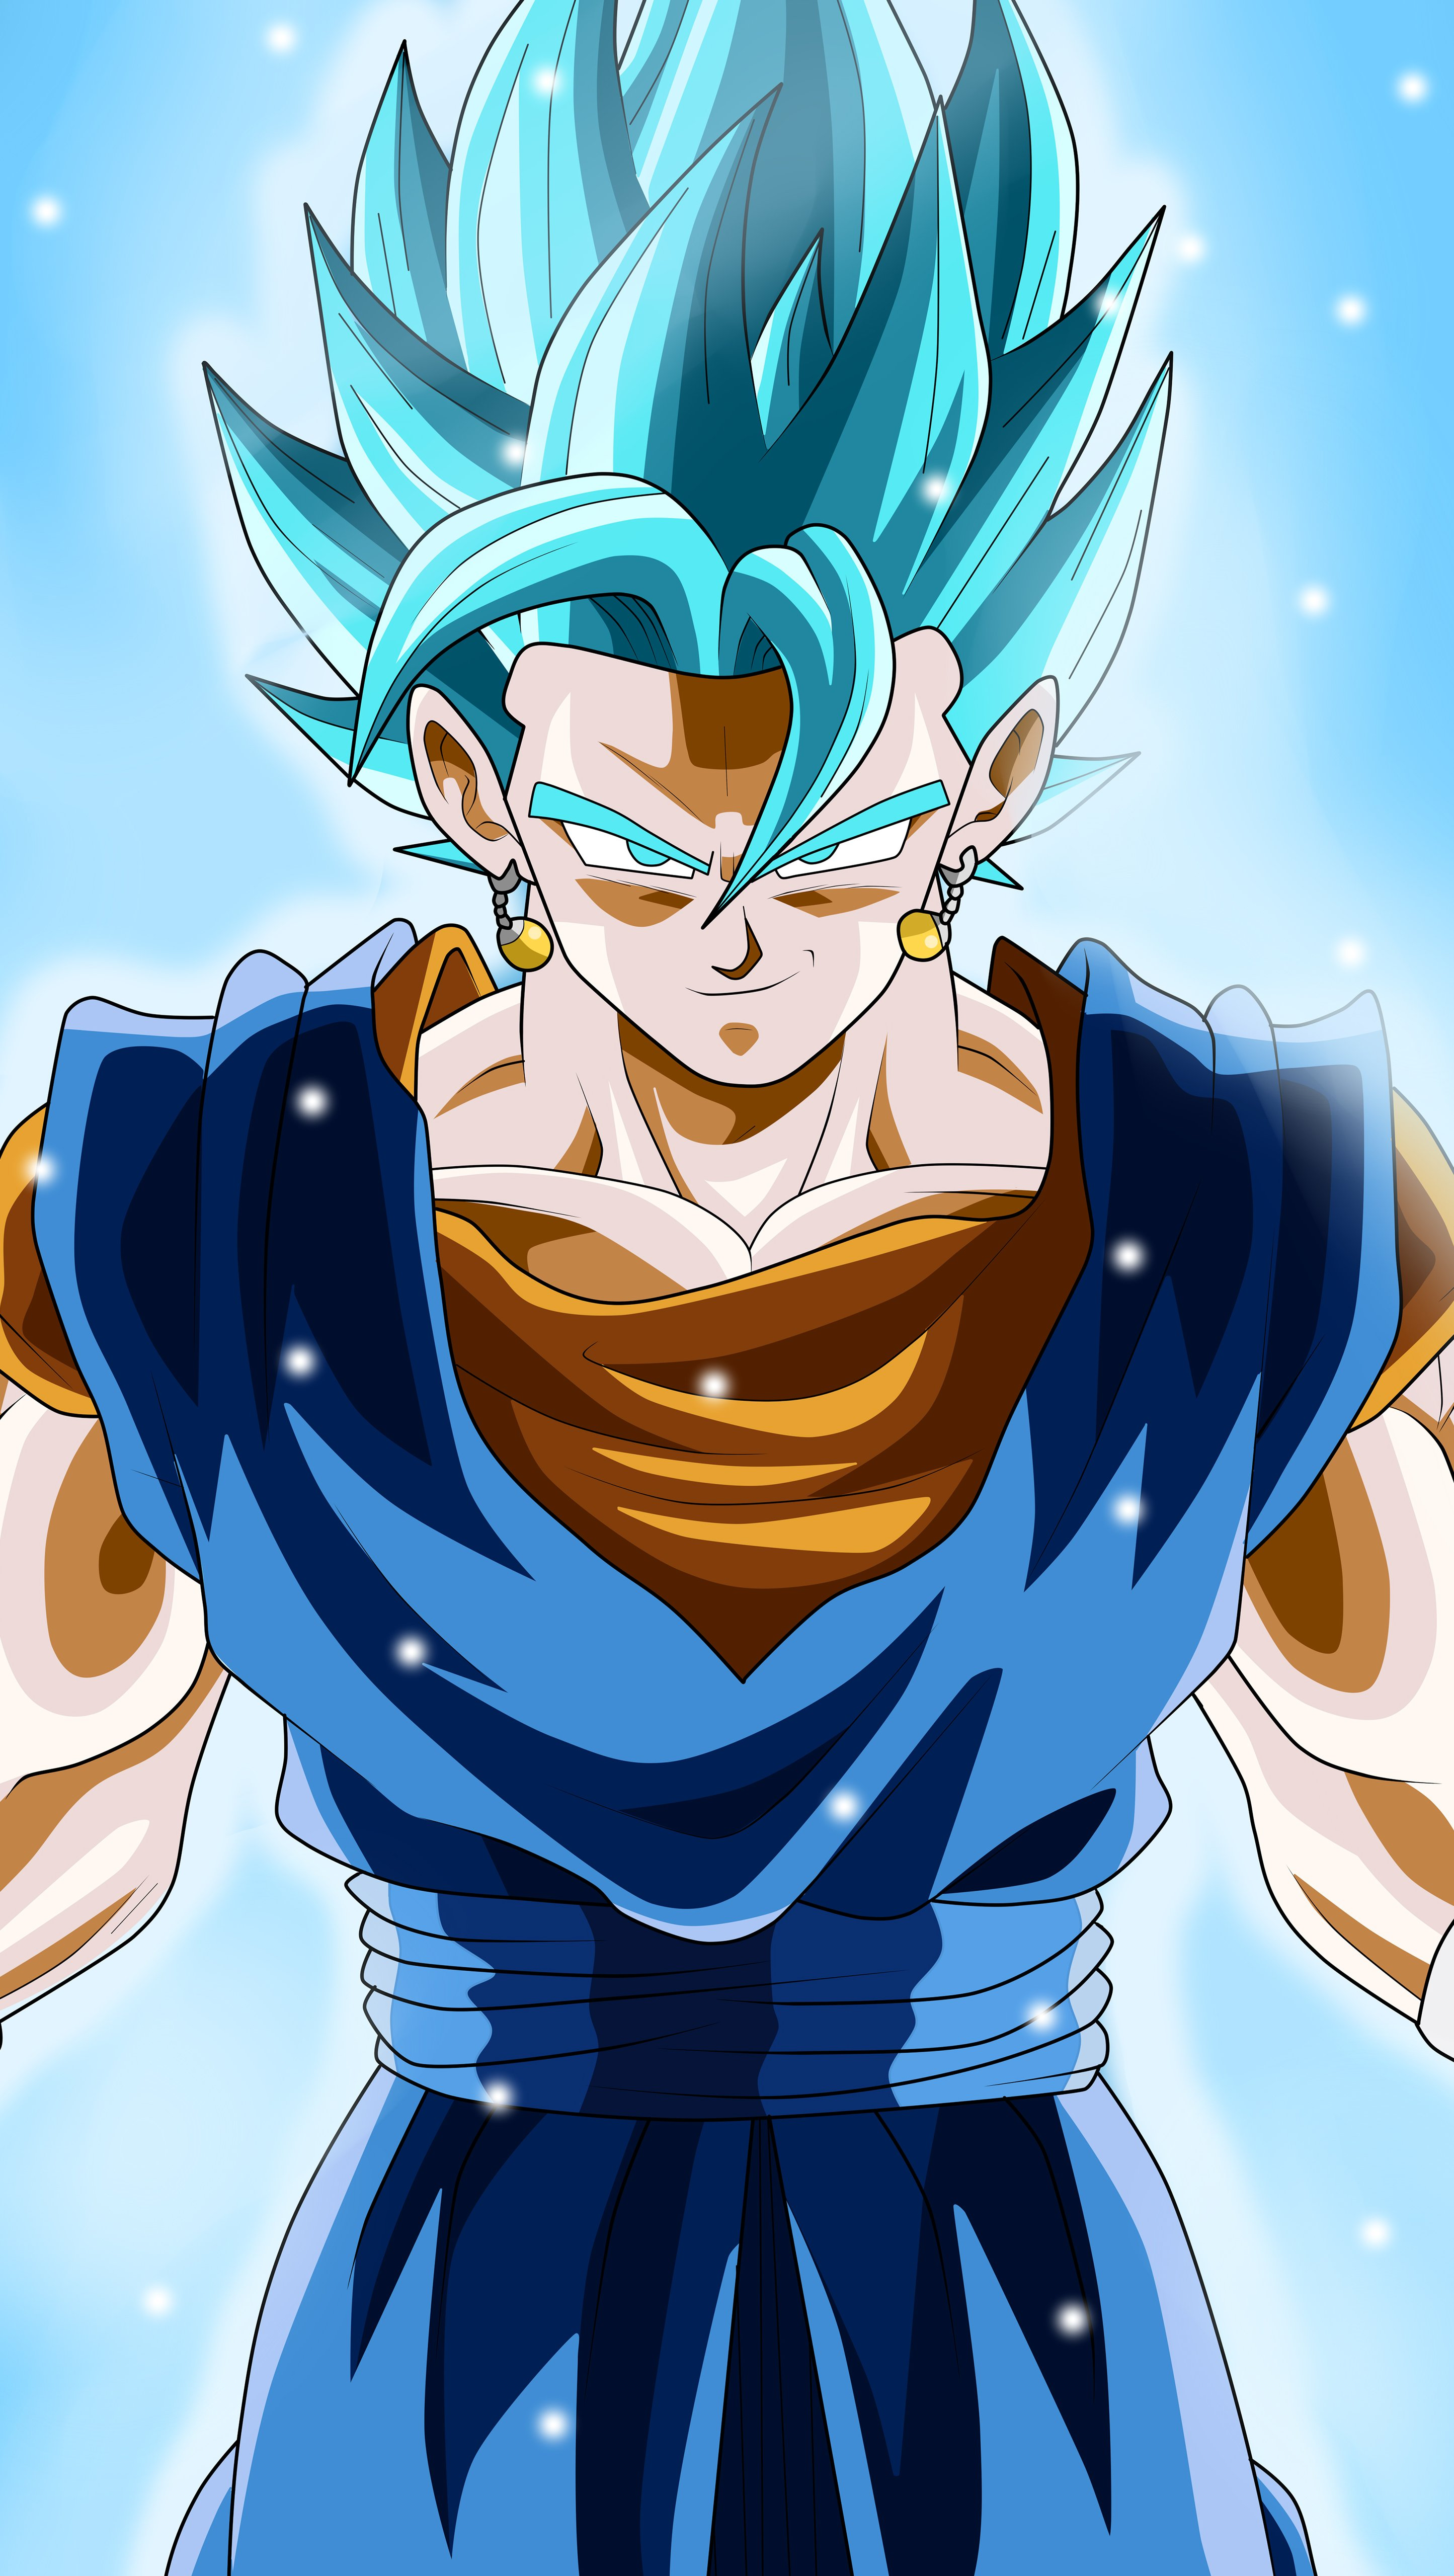 Anime Wallpaper Vegito / Vegetto from Dragon Ball Super Vertical